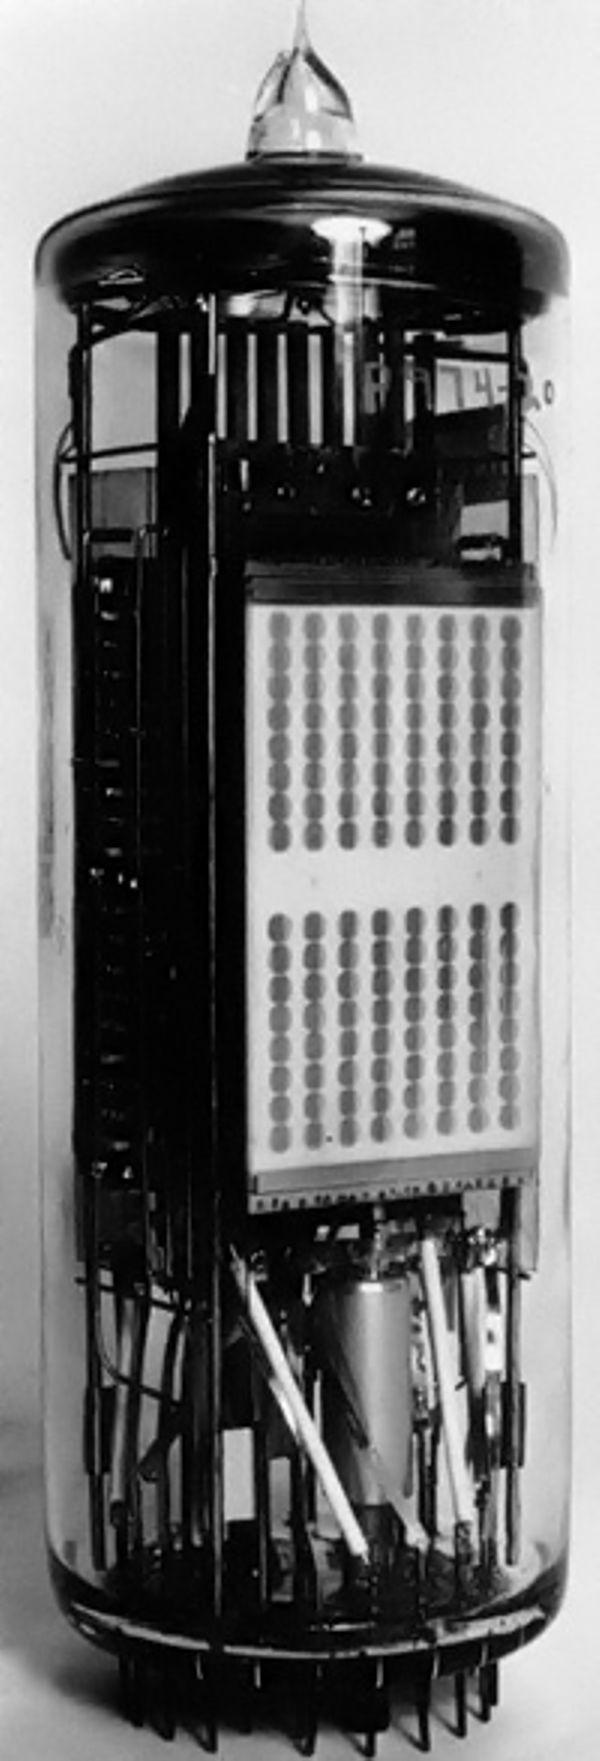 RCA Selectron memory tube